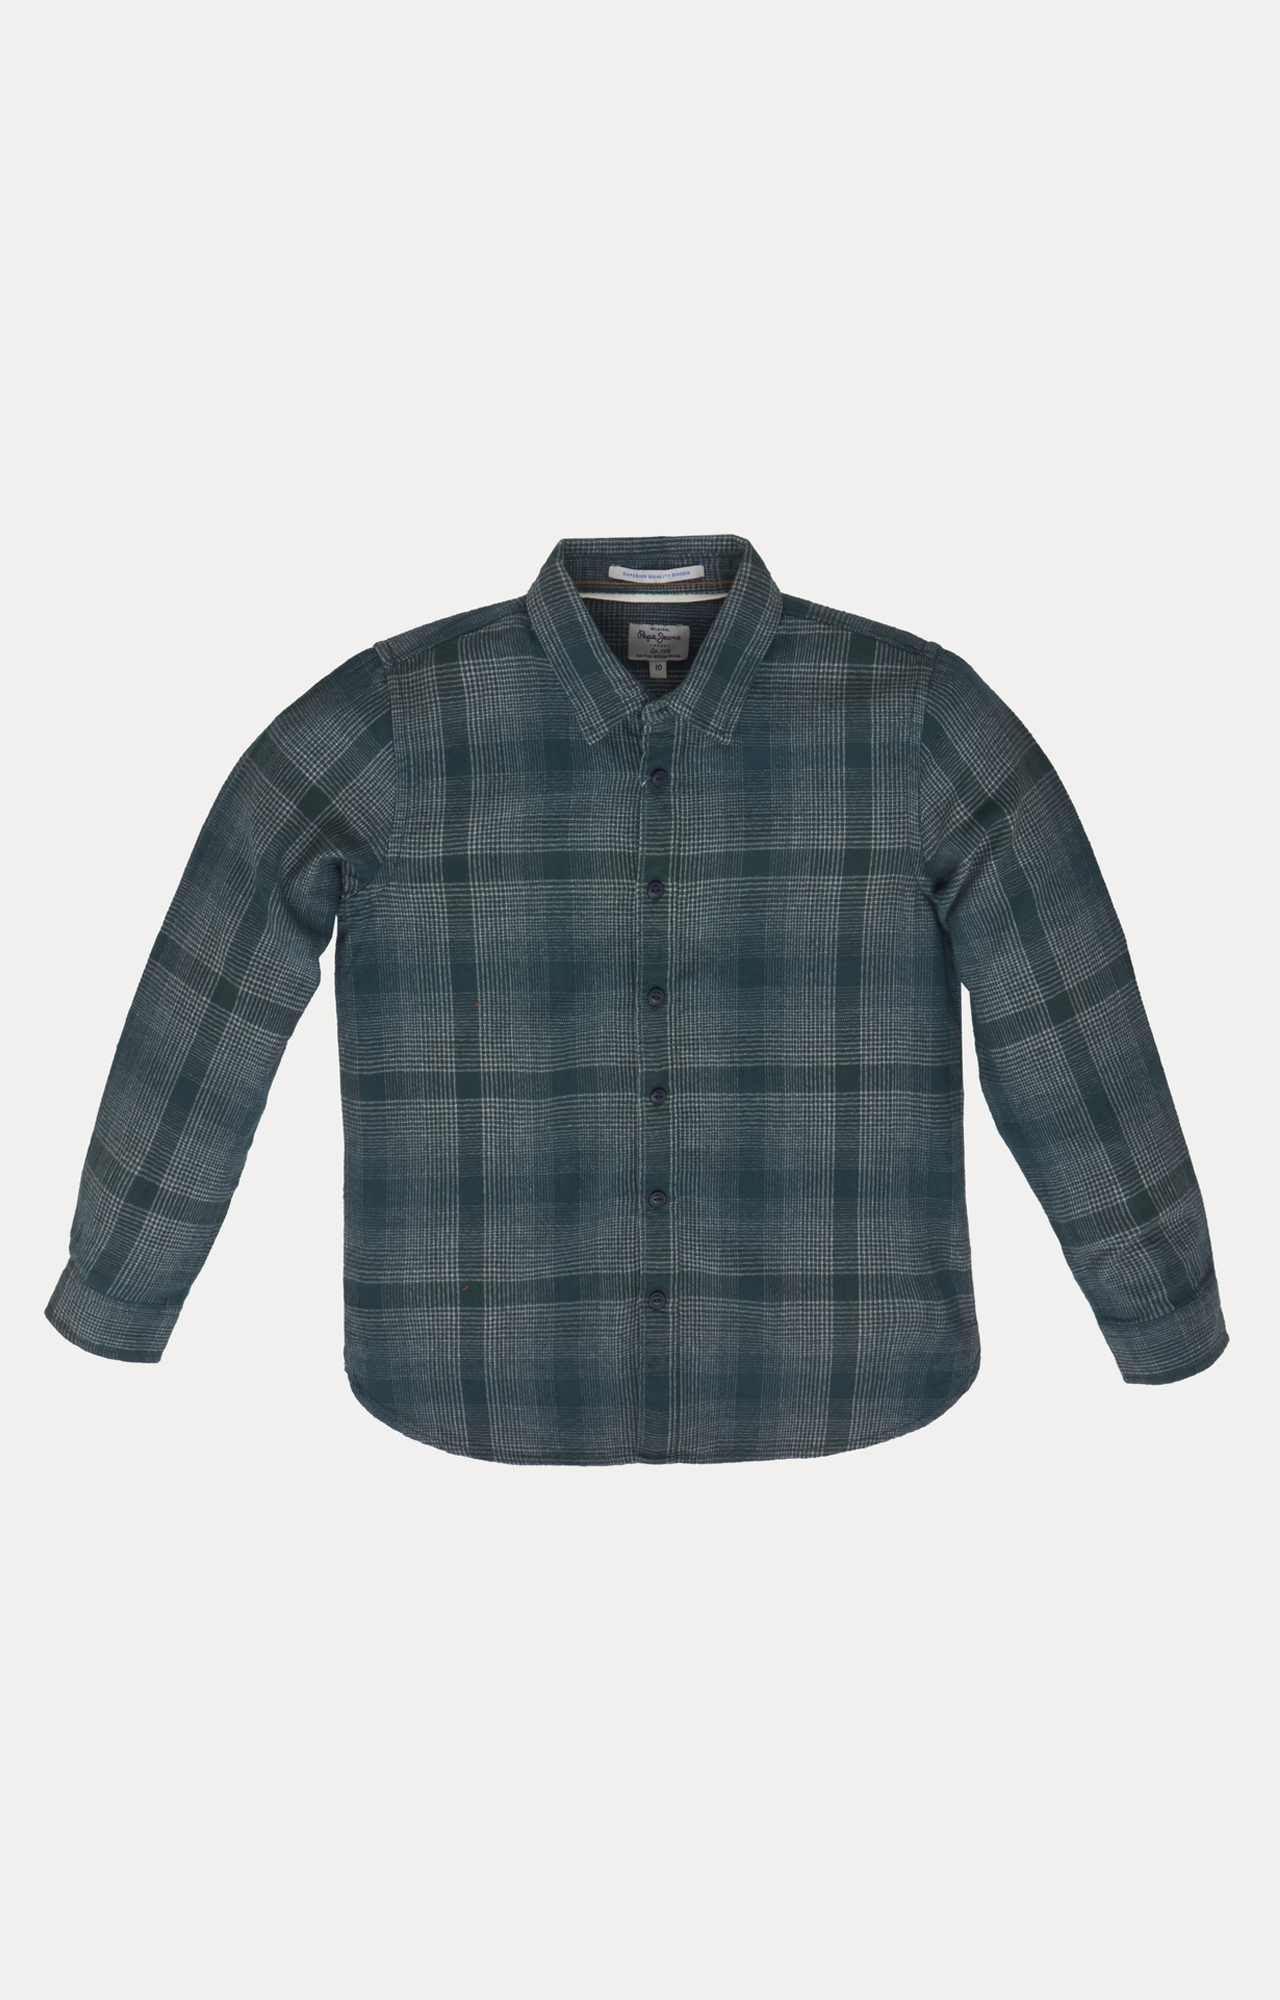 Pepe Jeans | Dark Green Checked Shirt